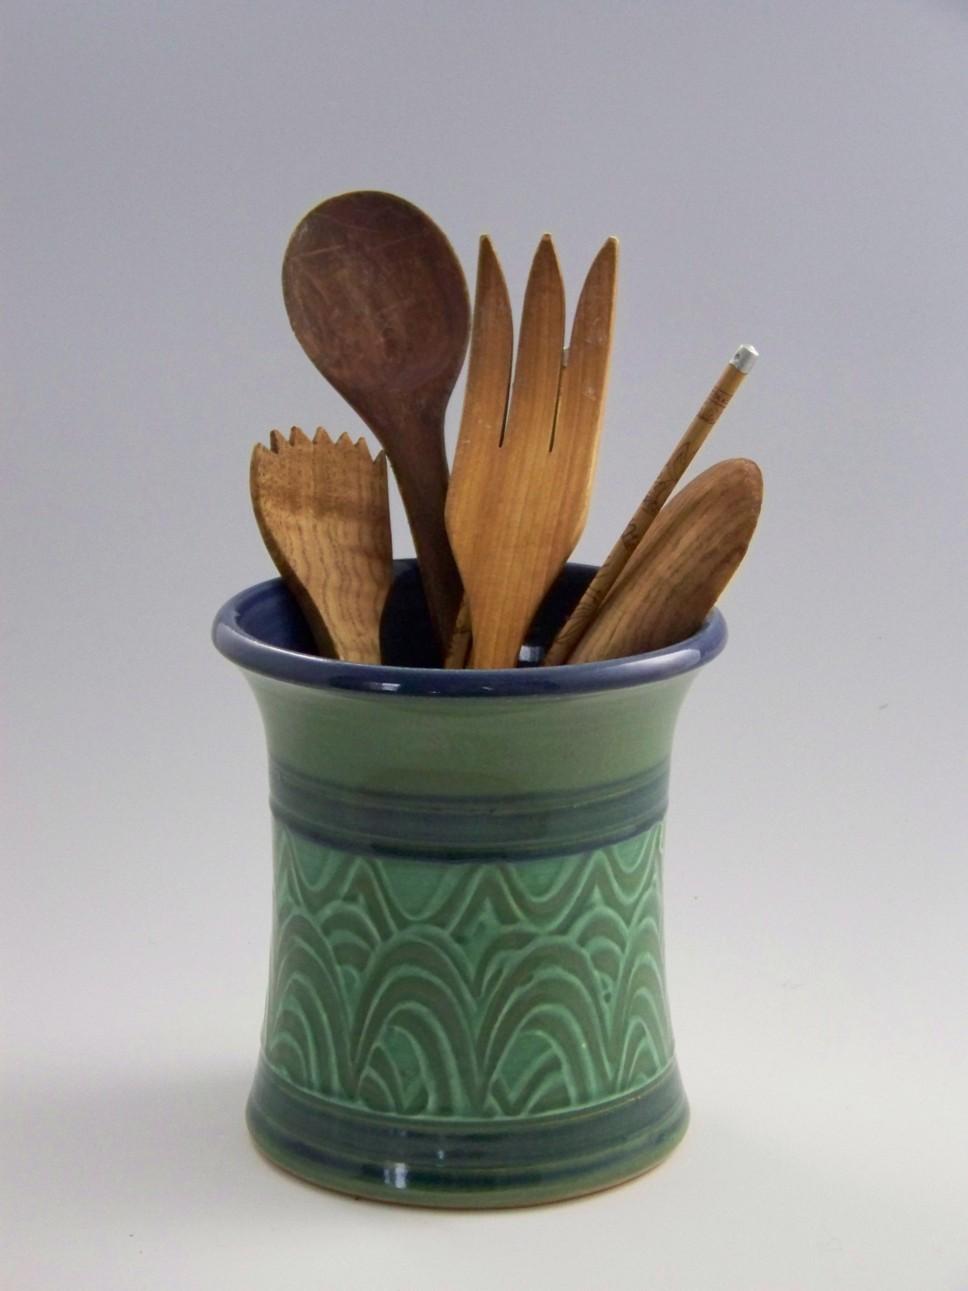 green utensil crop 42.jpg